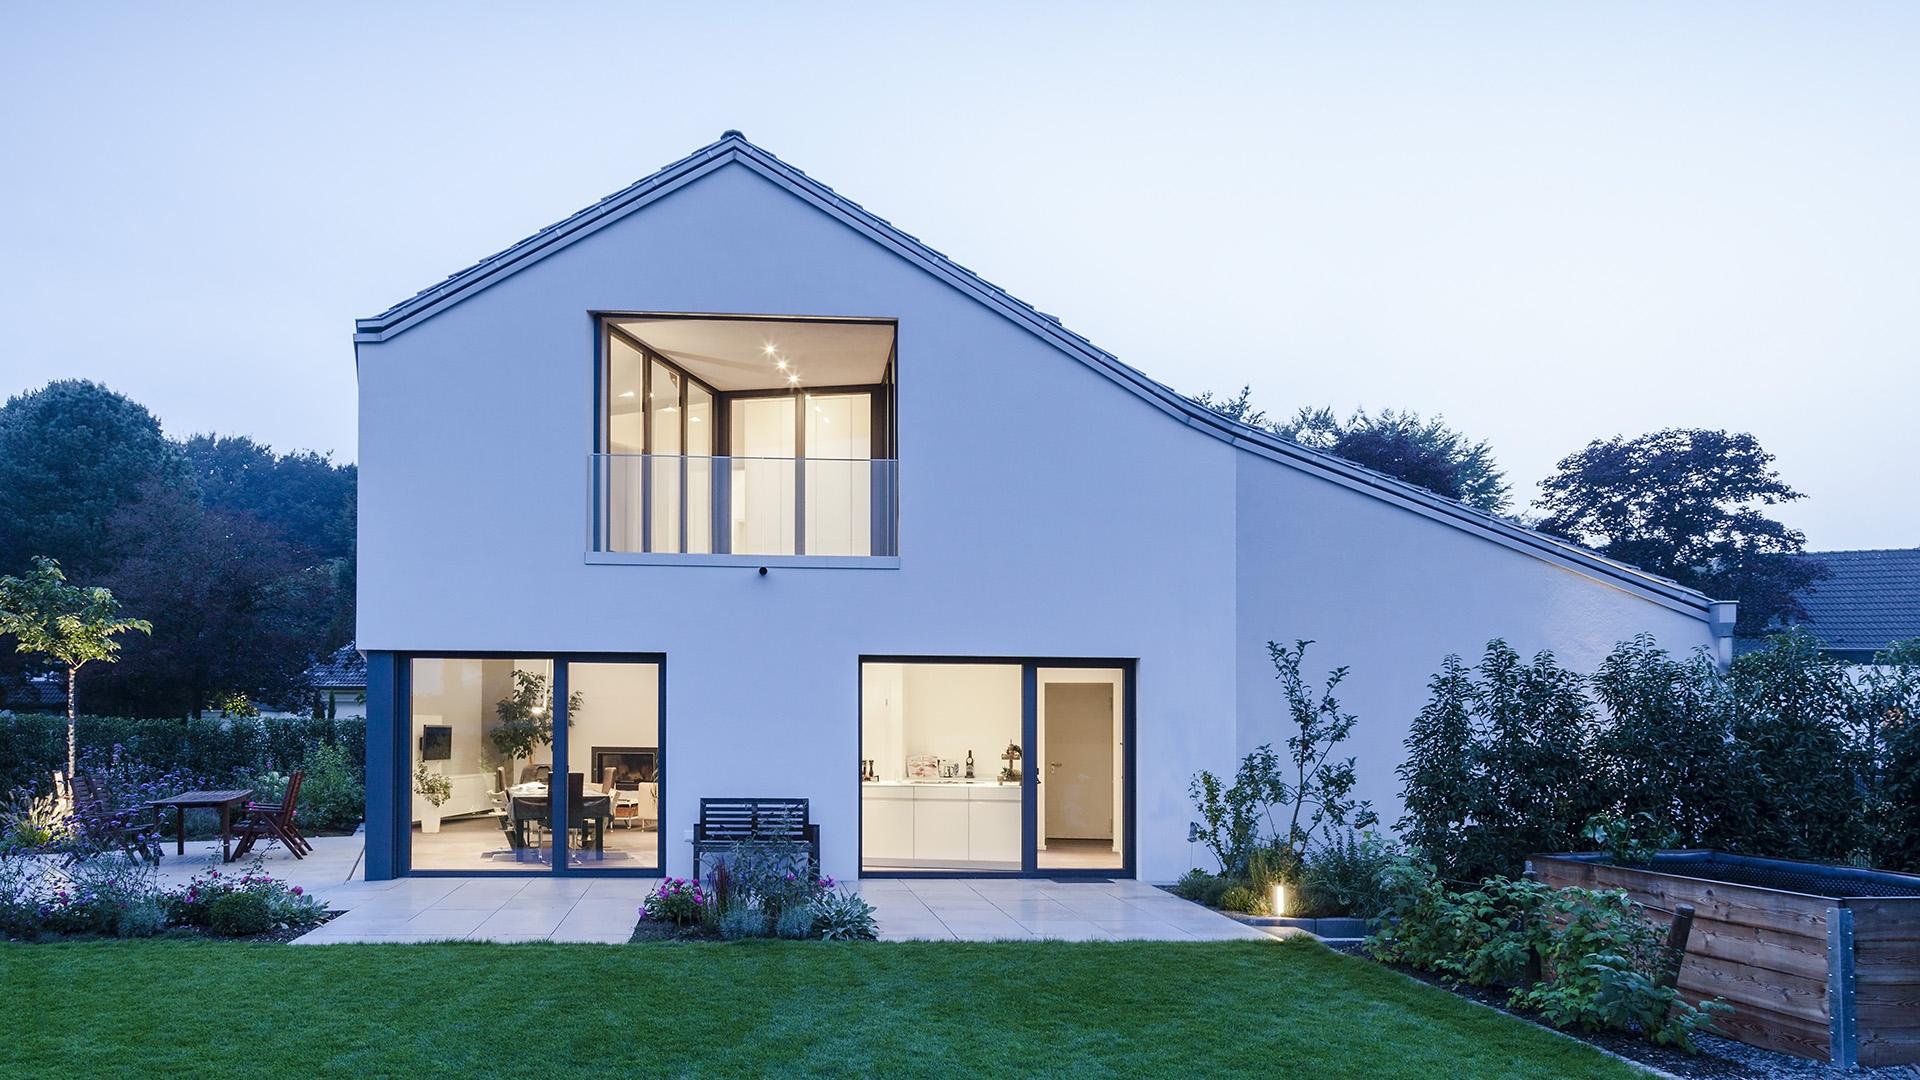 emejing architekt bergisch gladbach photos. Black Bedroom Furniture Sets. Home Design Ideas